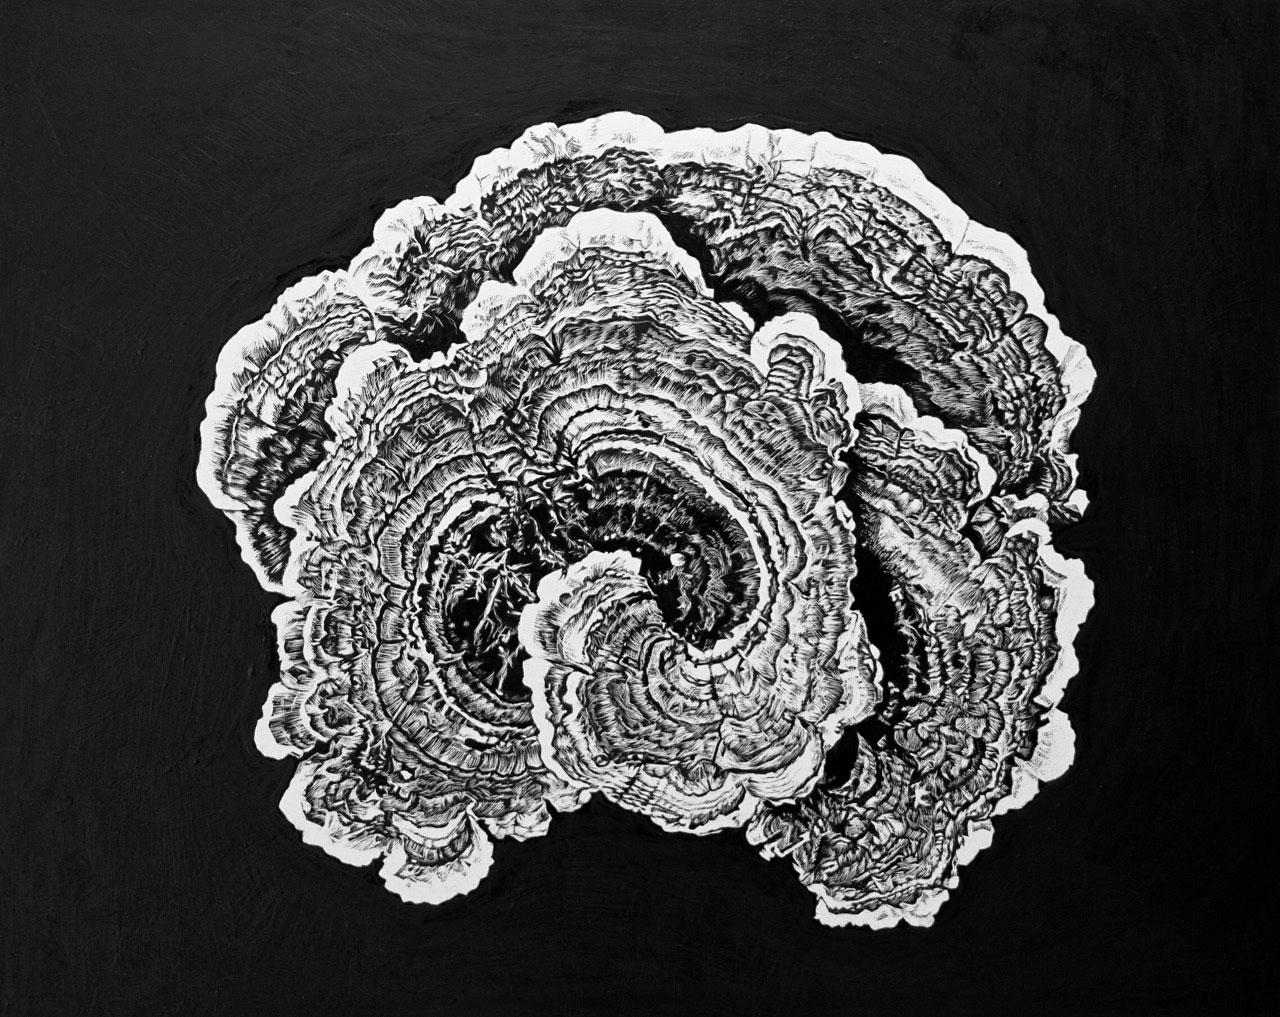 Turkey Tail Fungus - Horner Wood